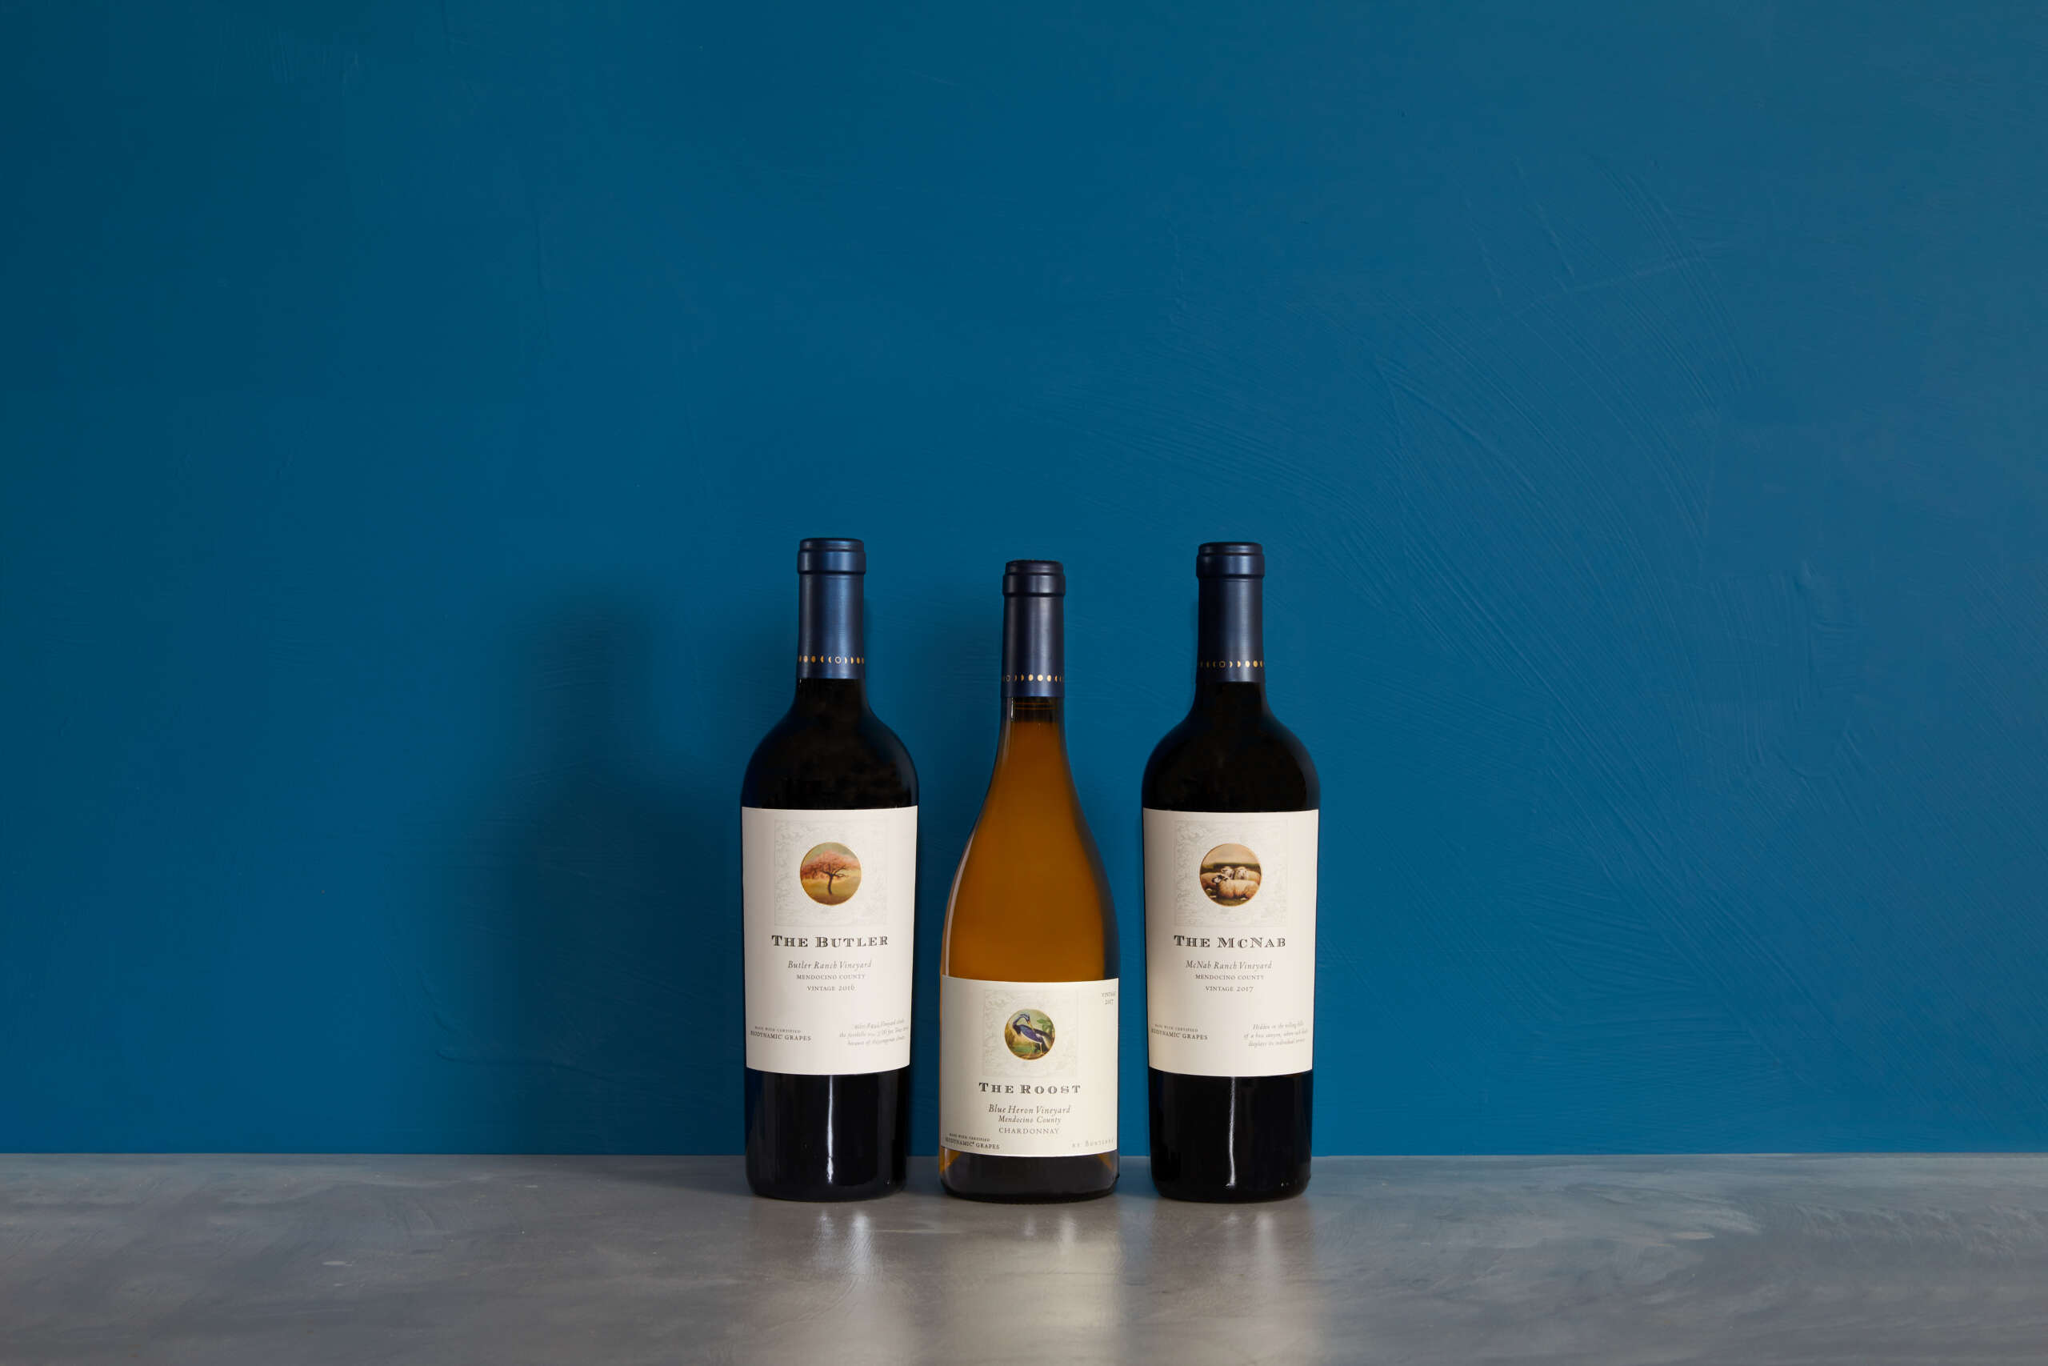 Bonterra Organically Farmed Wine Family Shot